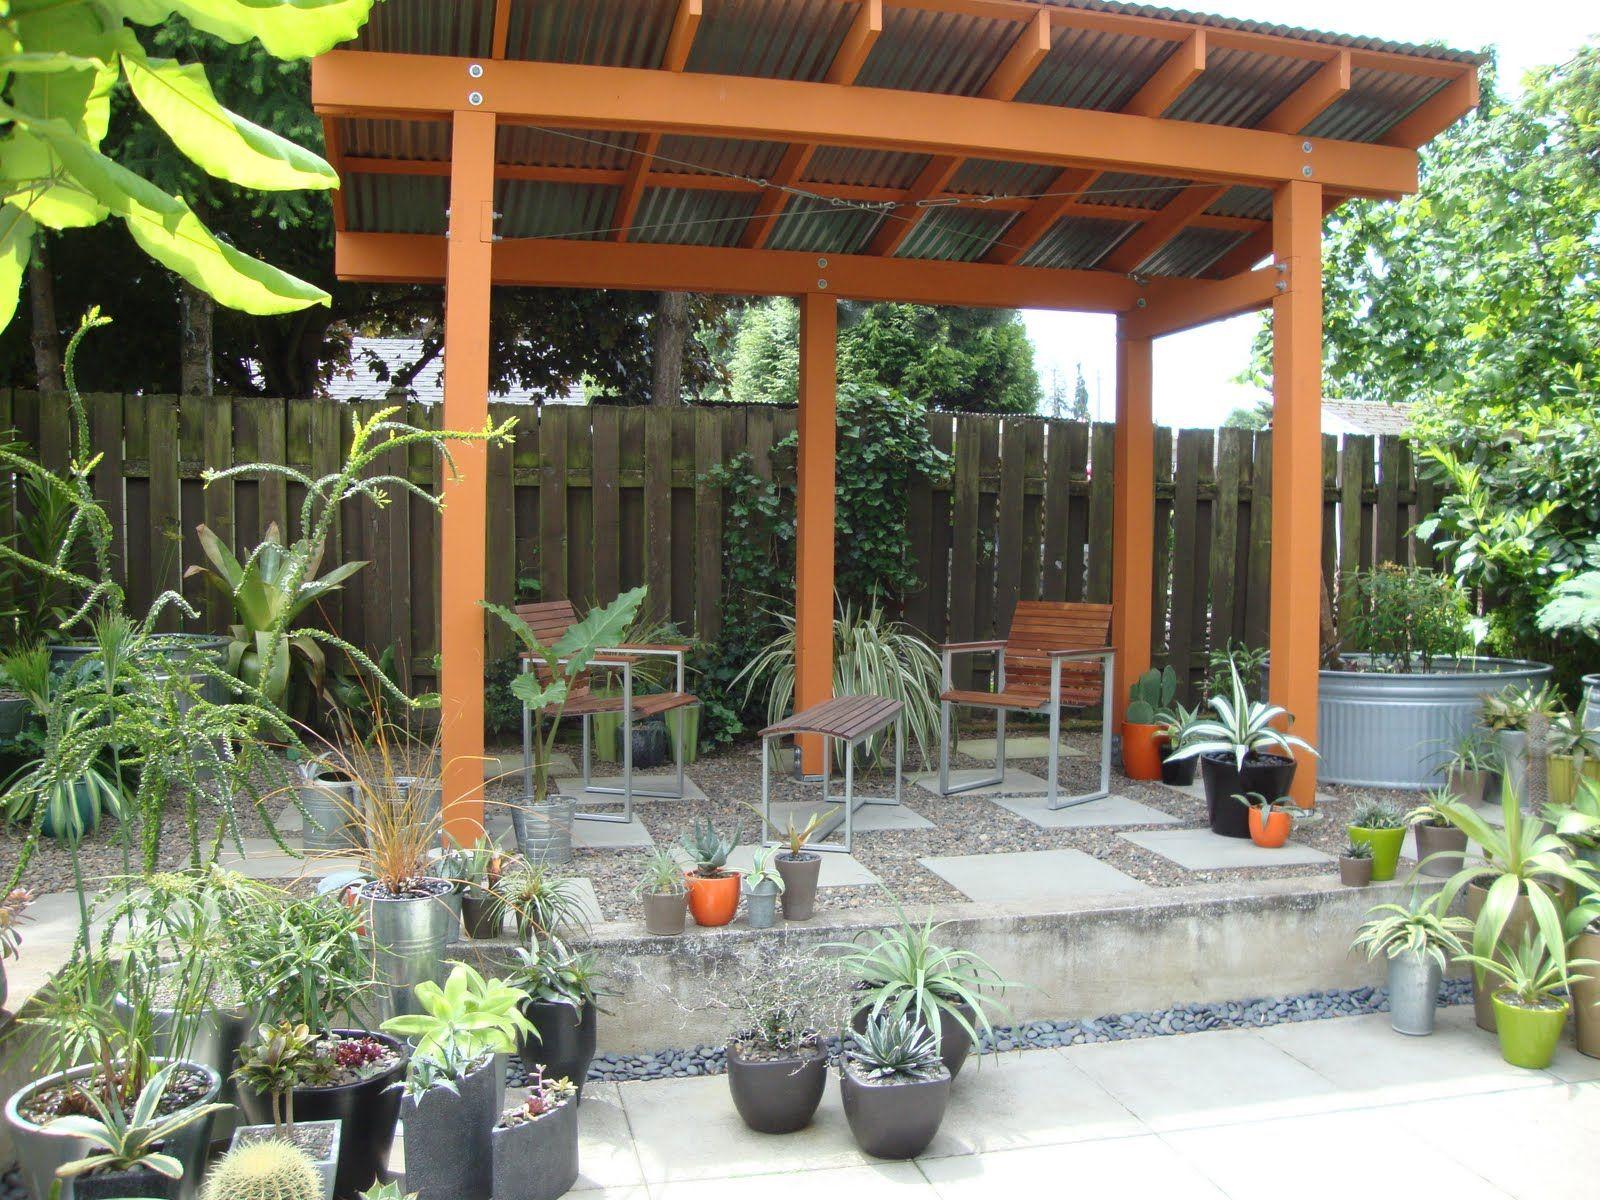 Overwintering Follow Up Report Backyard Shade Patio Shade Diy